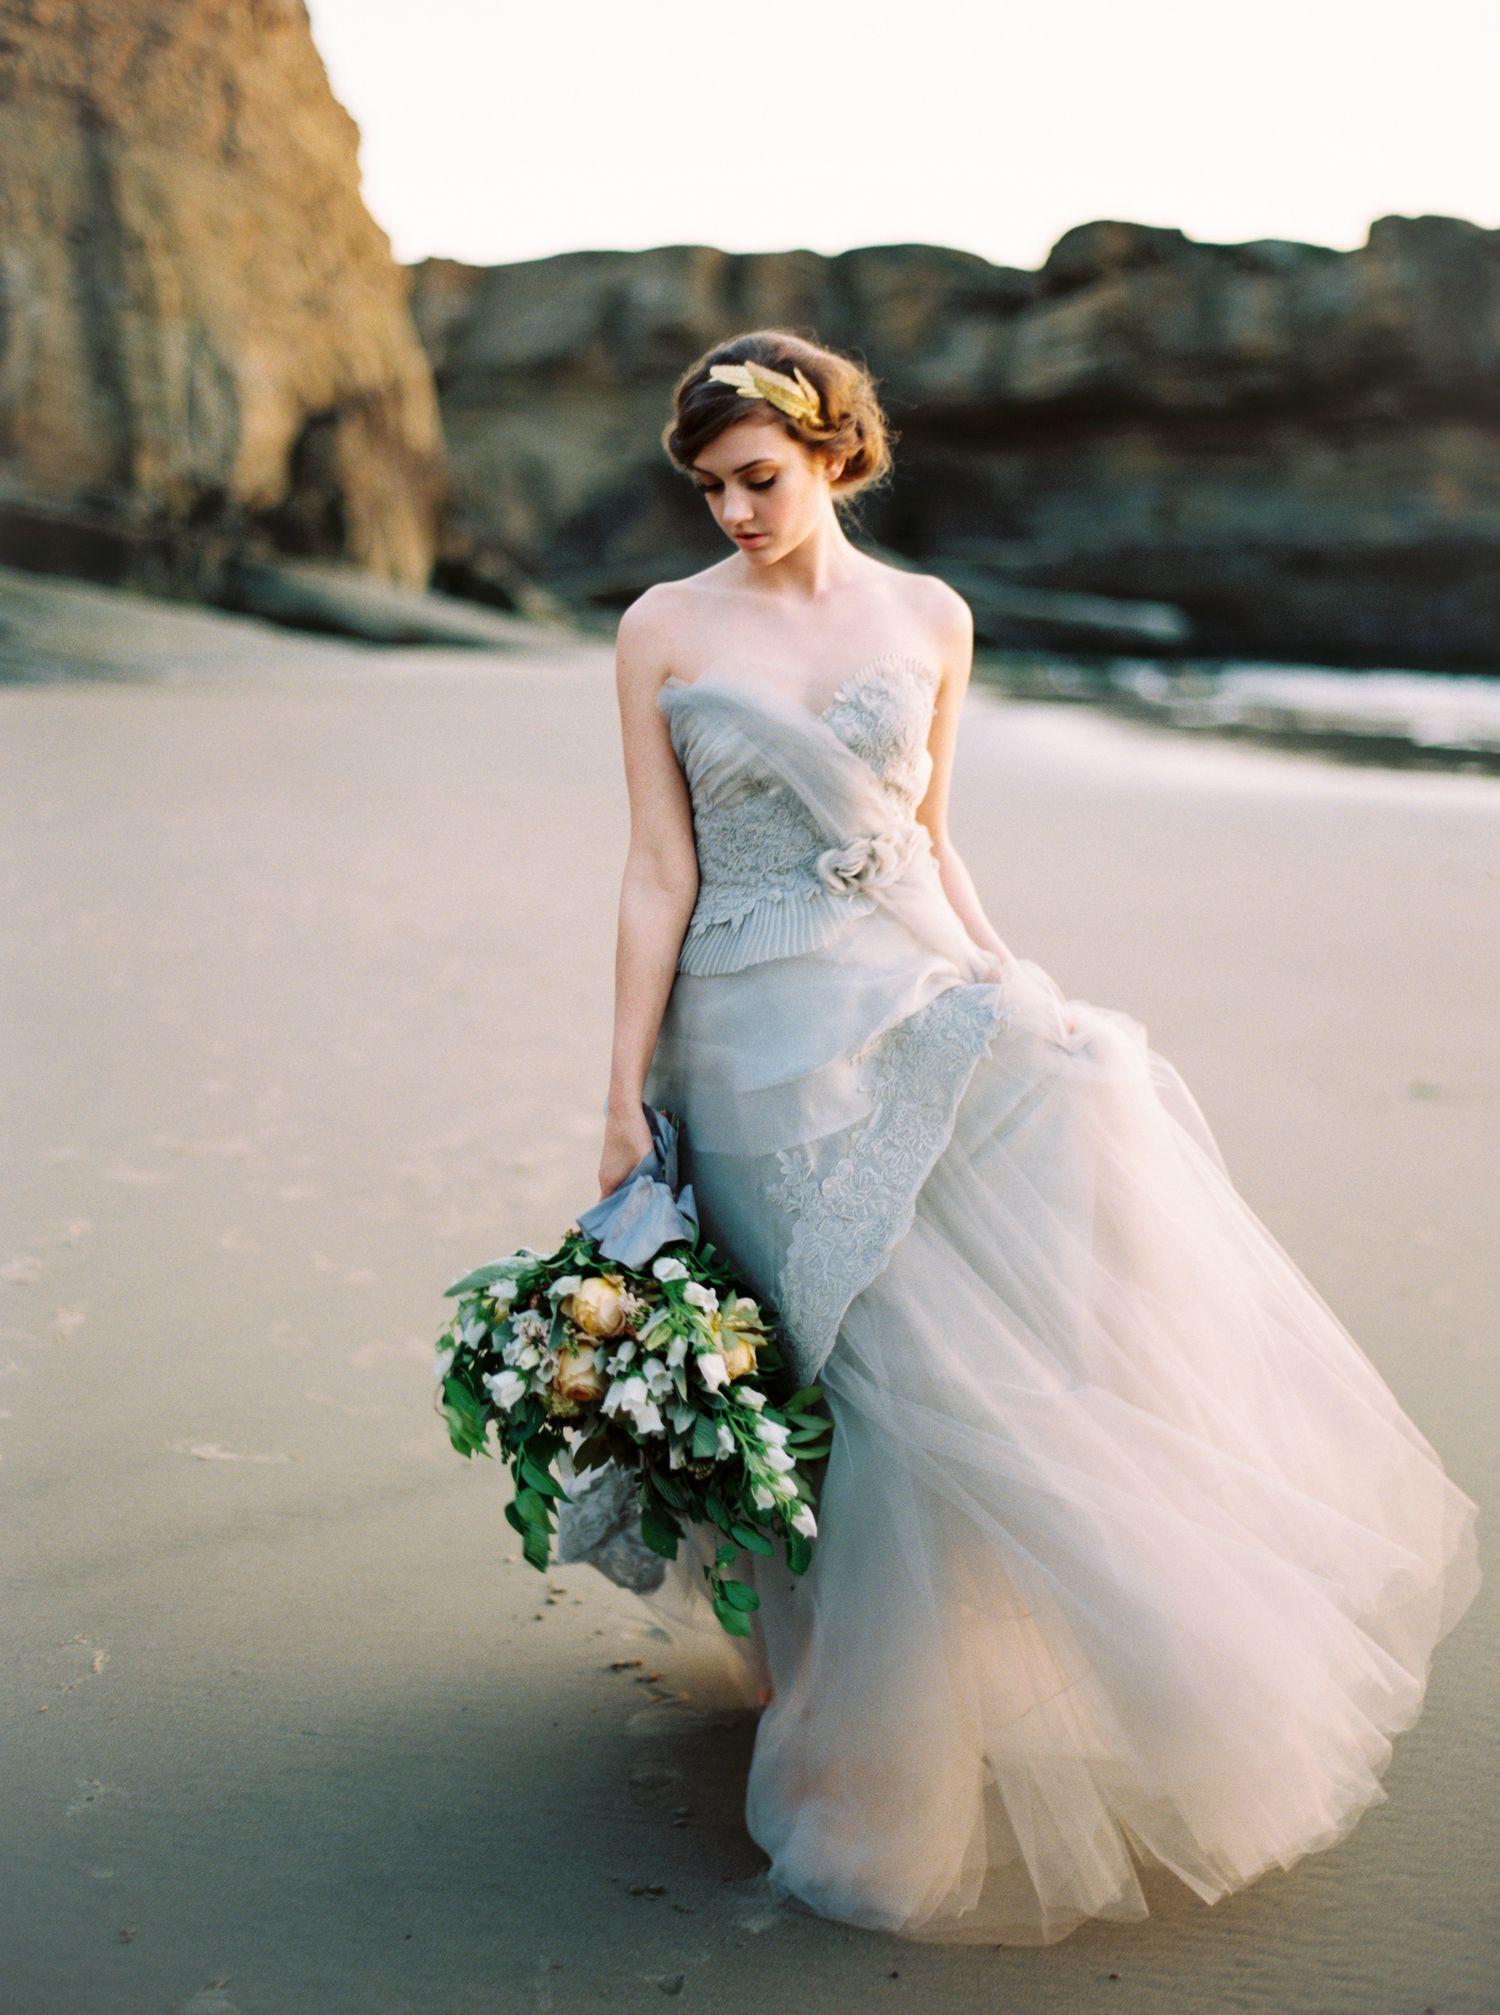 Wedding dresses downtown la  Swan Song  Wedding Attire ss  Pinterest  Downtown